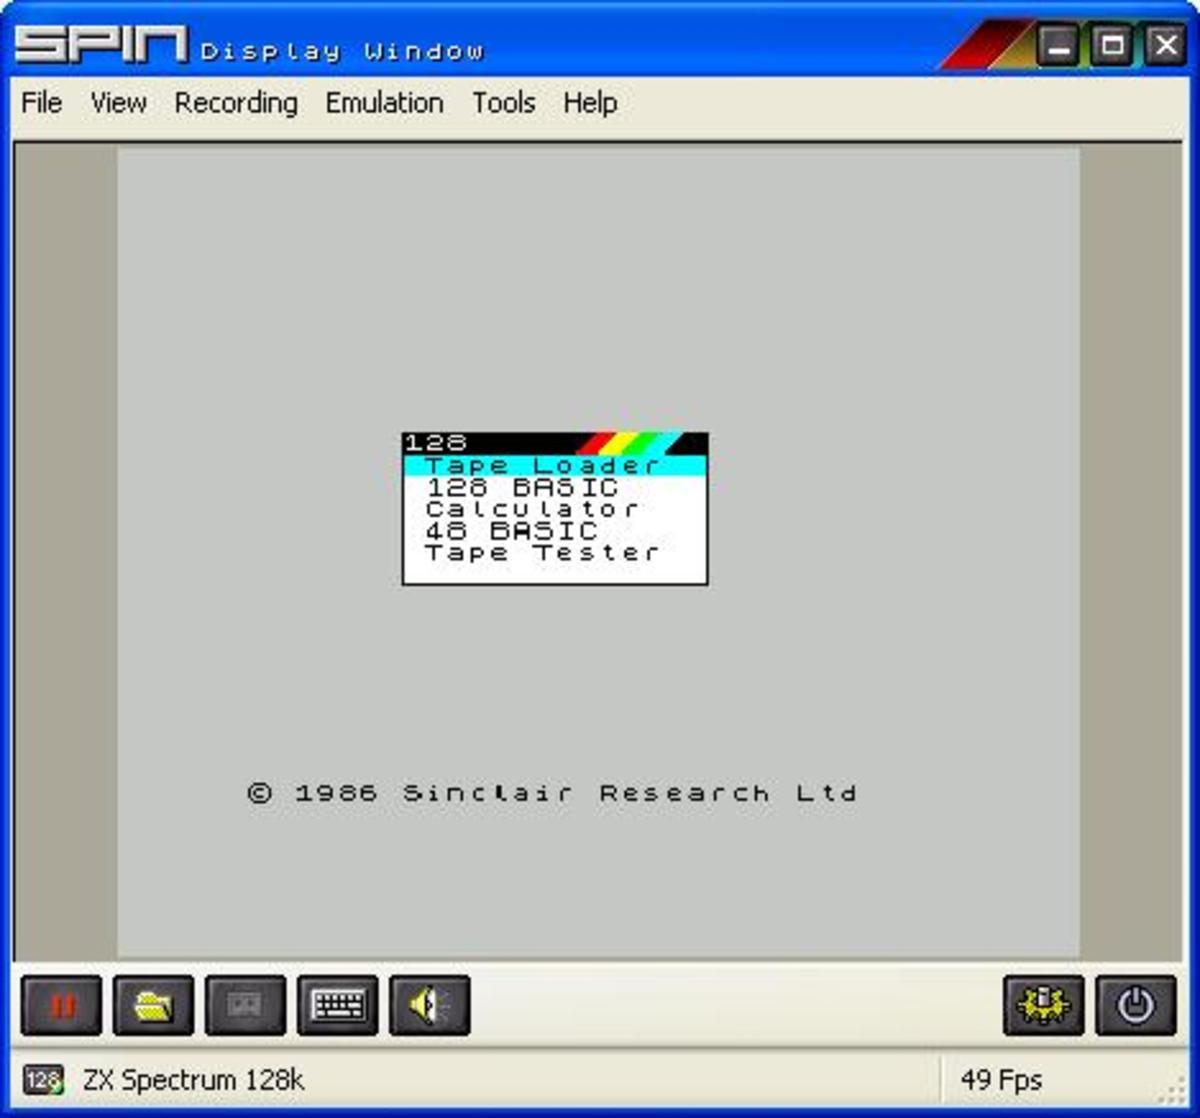 ZX Spectrum 128 mode